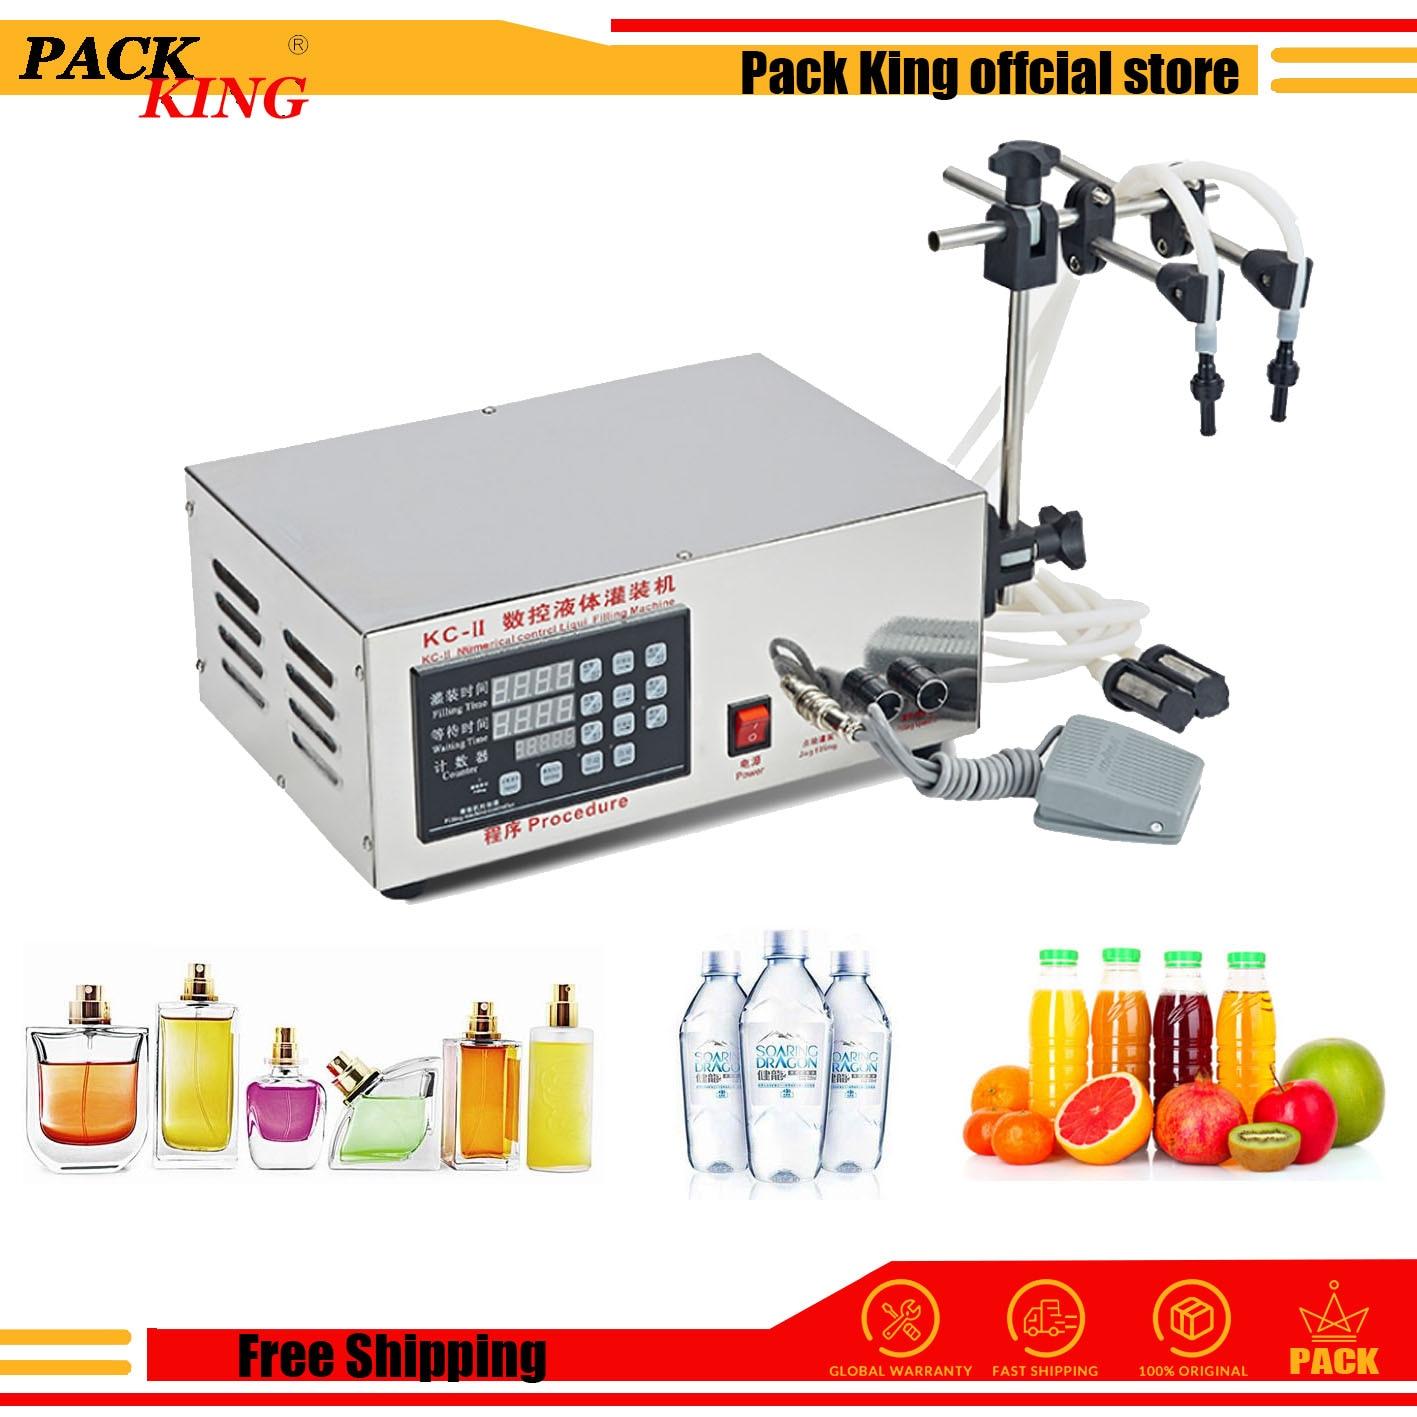 Digital Double Head Liquid Filling Machine Microcomputer Automatic Water Liquid Filler Drinks Milk Juice Liquor Free Shipping